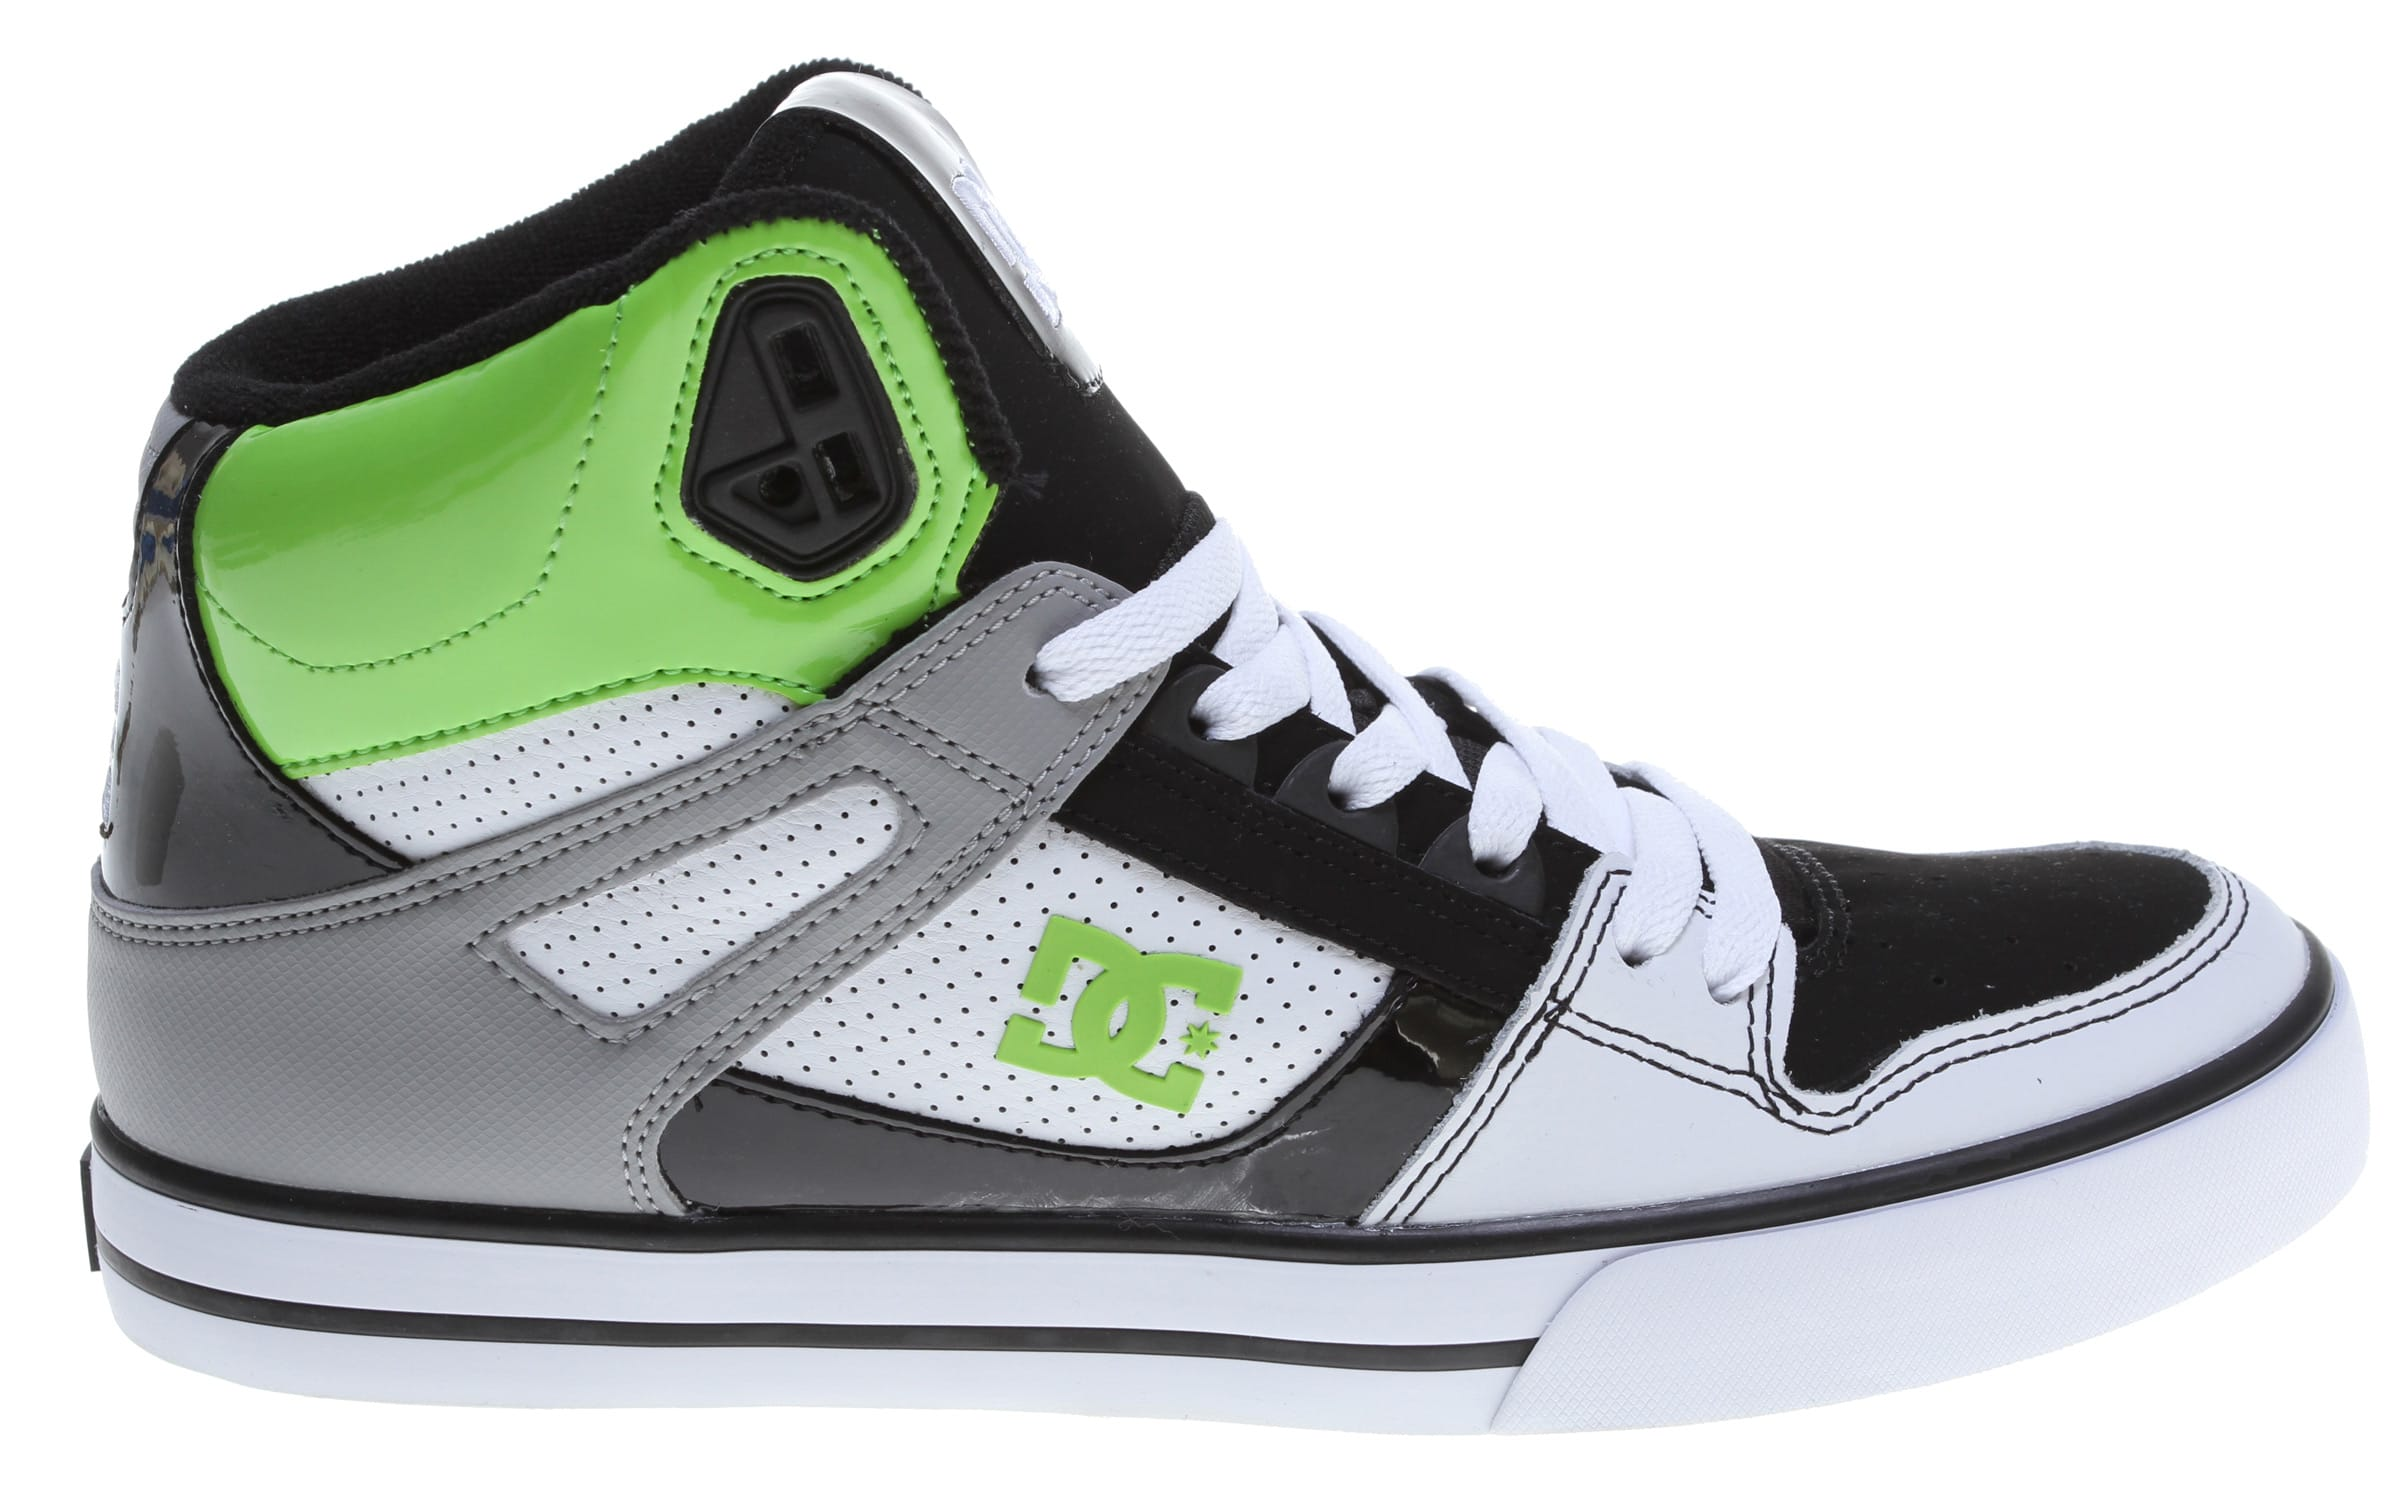 5fc427faf82f4f DC Spartan HI WC Skate Shoes - thumbnail 1